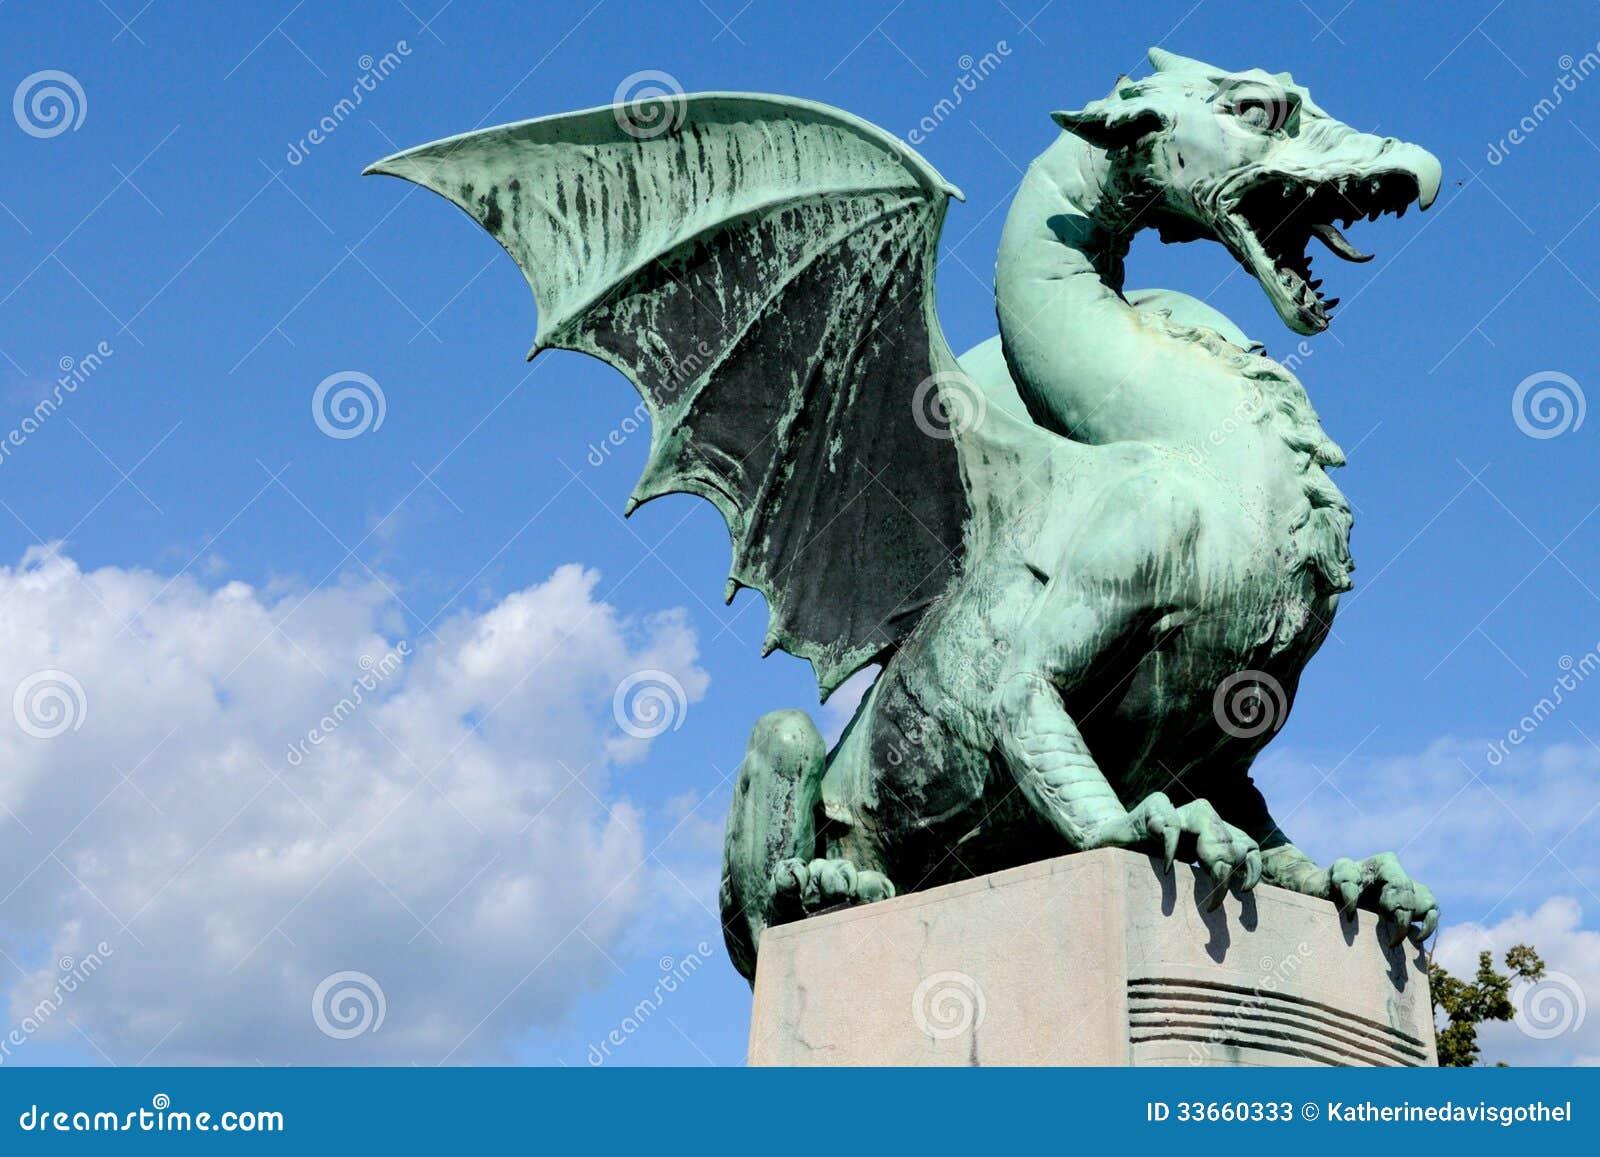 Dragon Bridge Ljubljana Slovenia